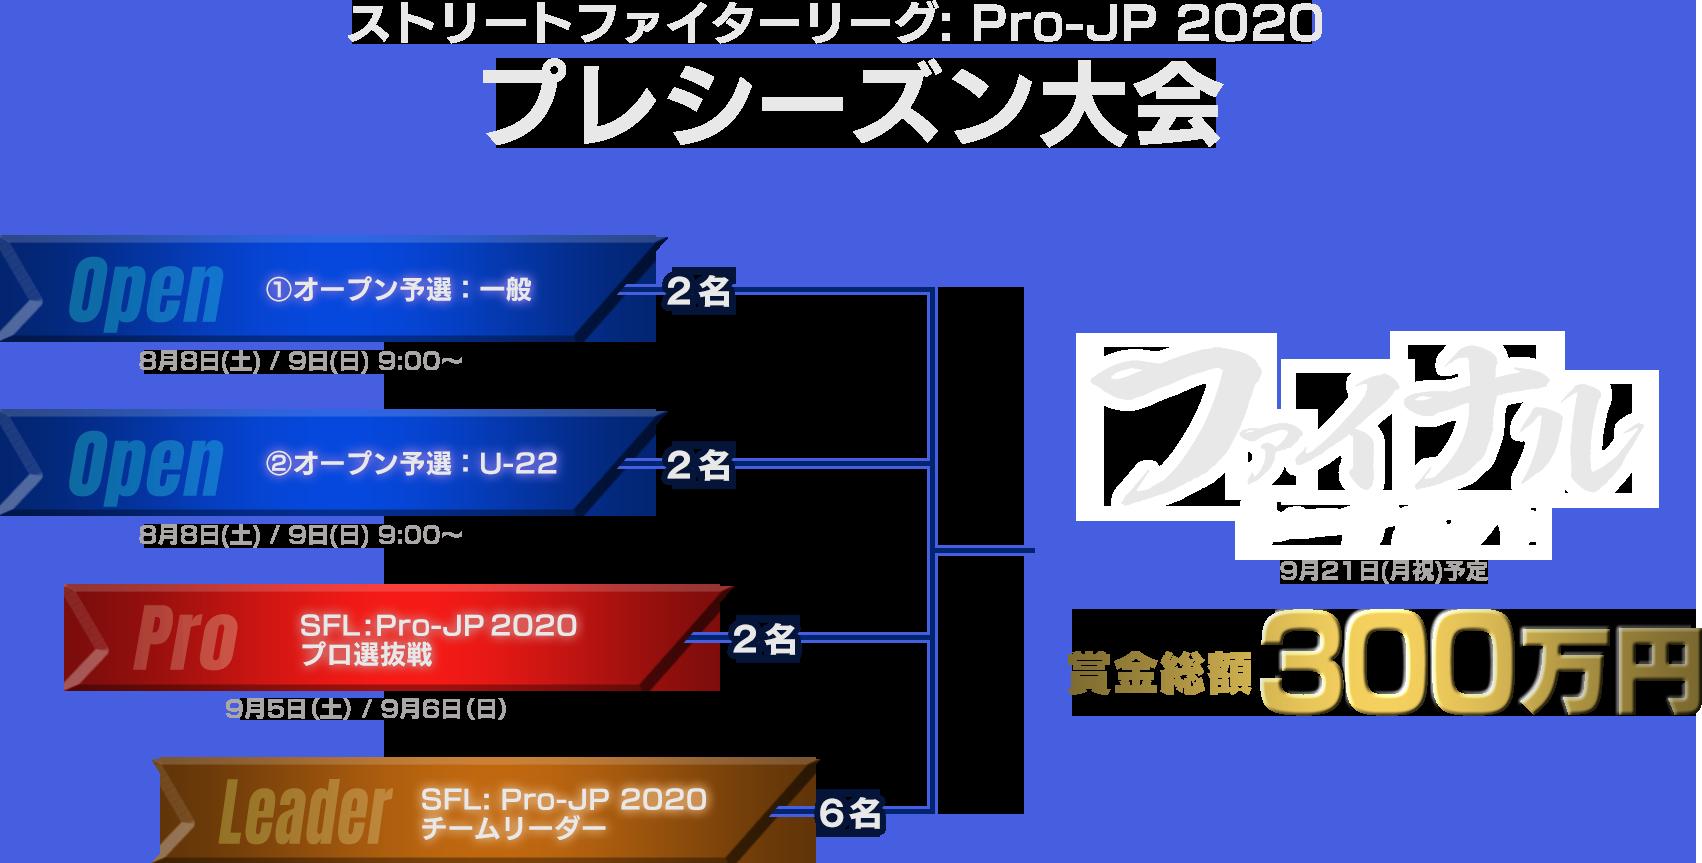 2020 JP SFL Pre-season hotlinked image